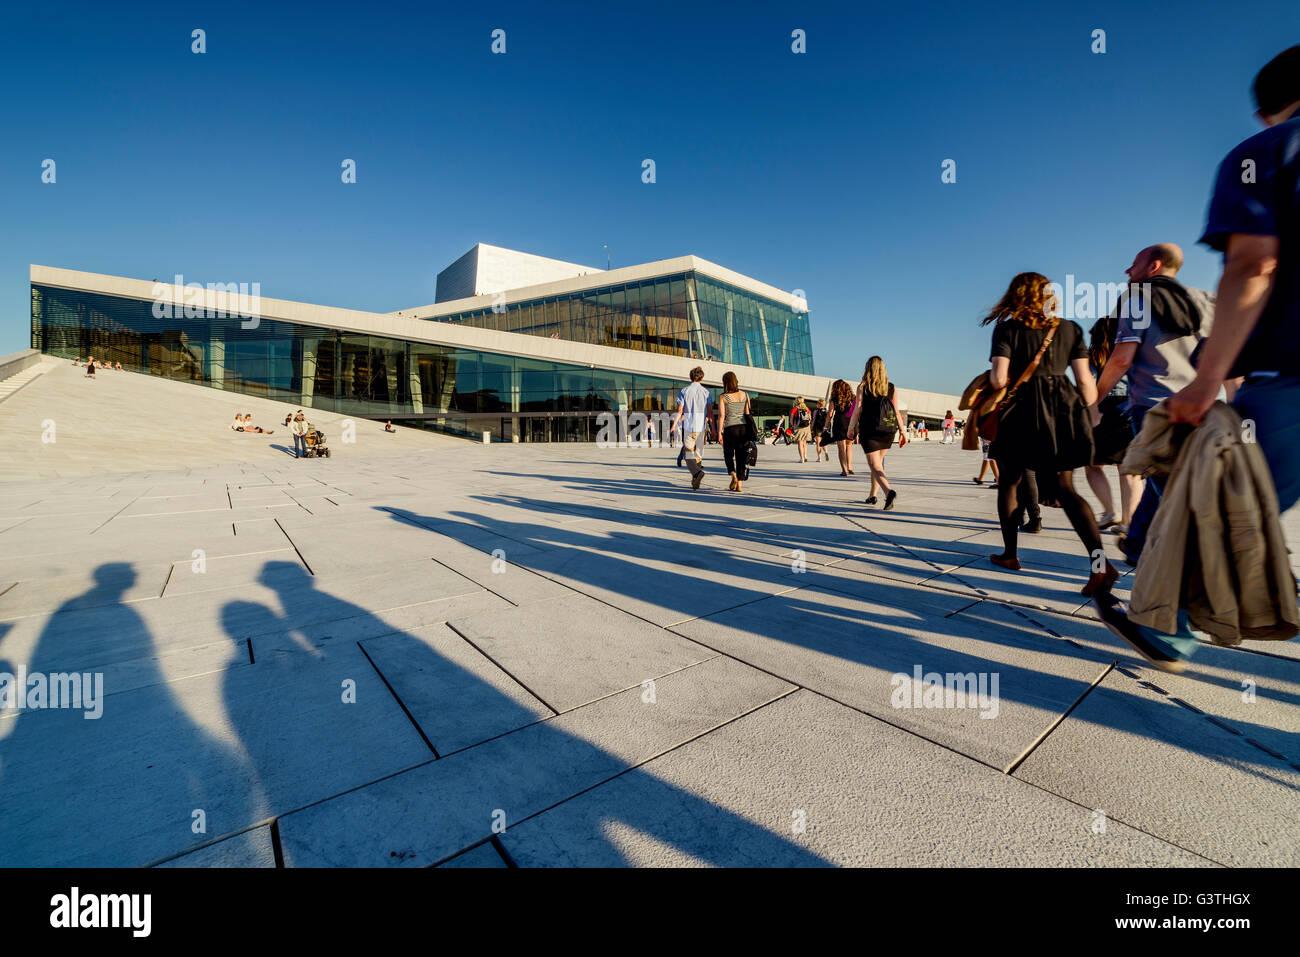 Norway, Oslo, Bjorvika, Operahuset - Stock Image